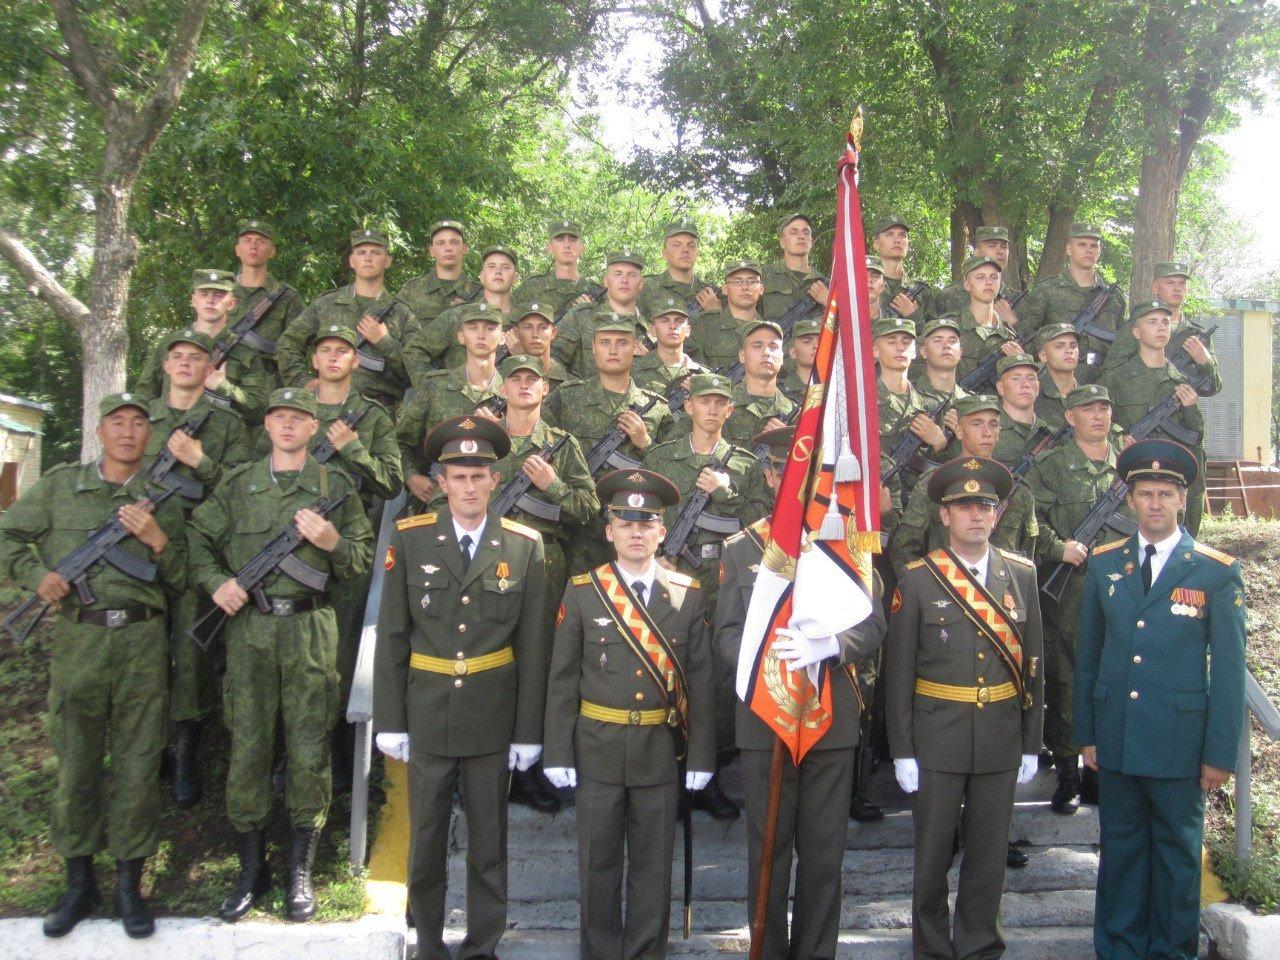 ВЧ 29753. Знамя 9-го полка